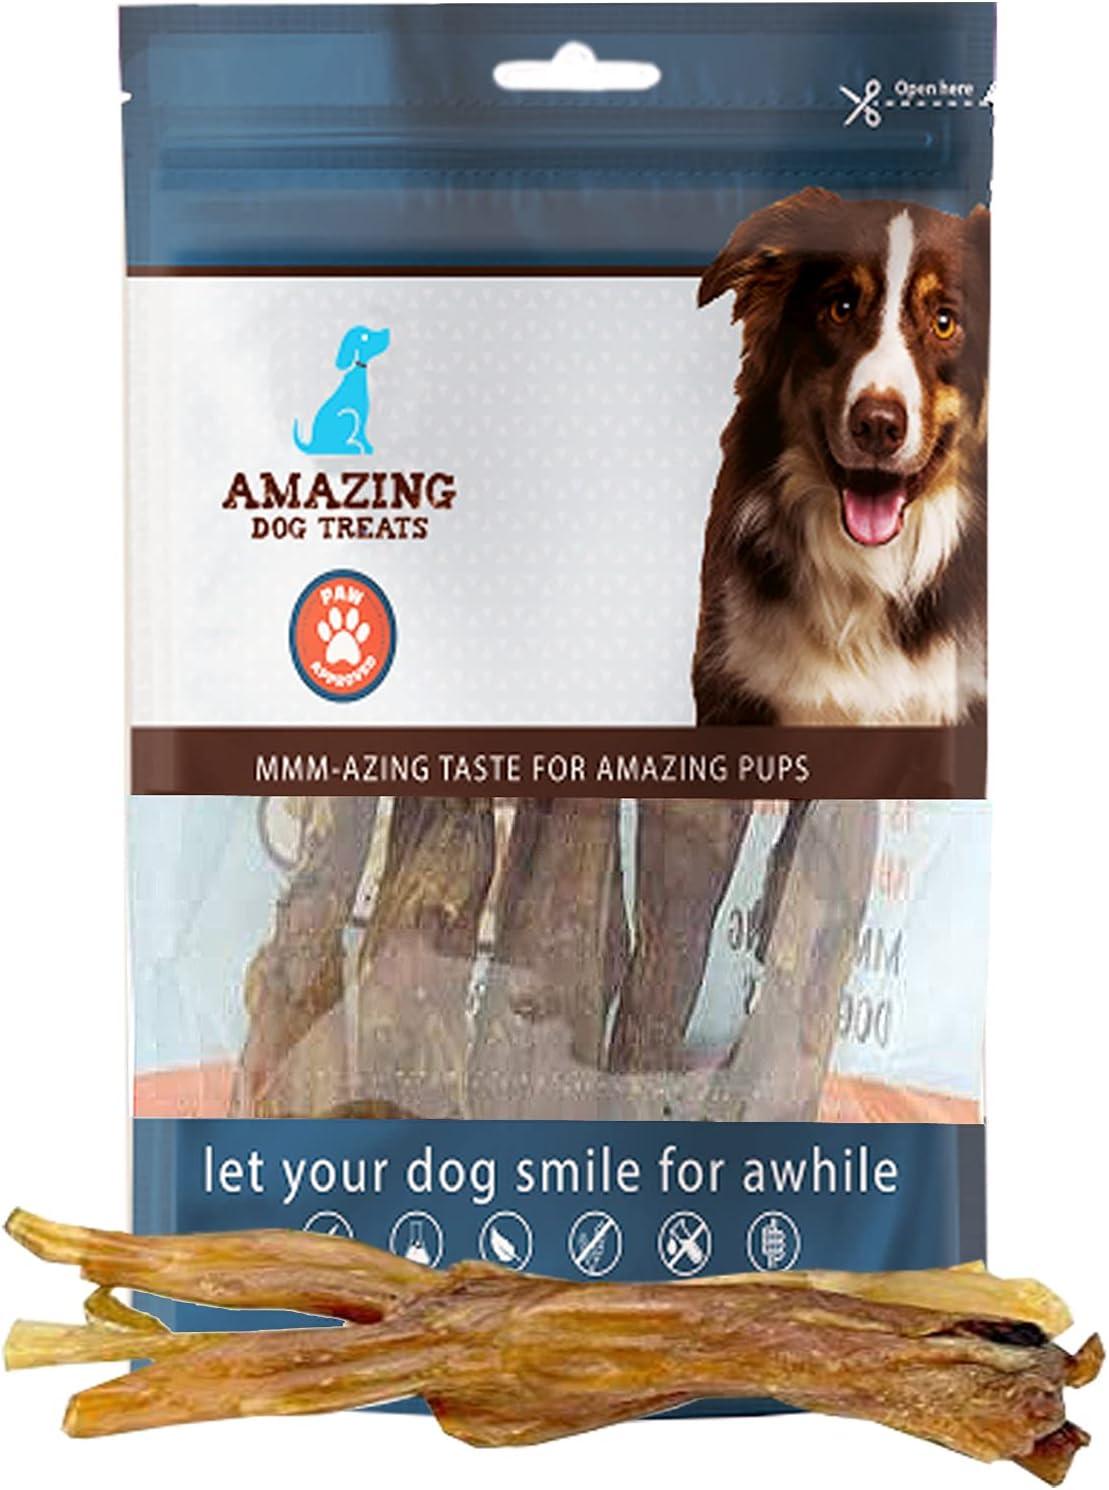 Jumbo Wishbone Beef Tendon Dog Chews (15 pcs/Pack) - 100 % Pure Beef Dog Treats - Beef Bones for Dogs - Tendon Dog Chews